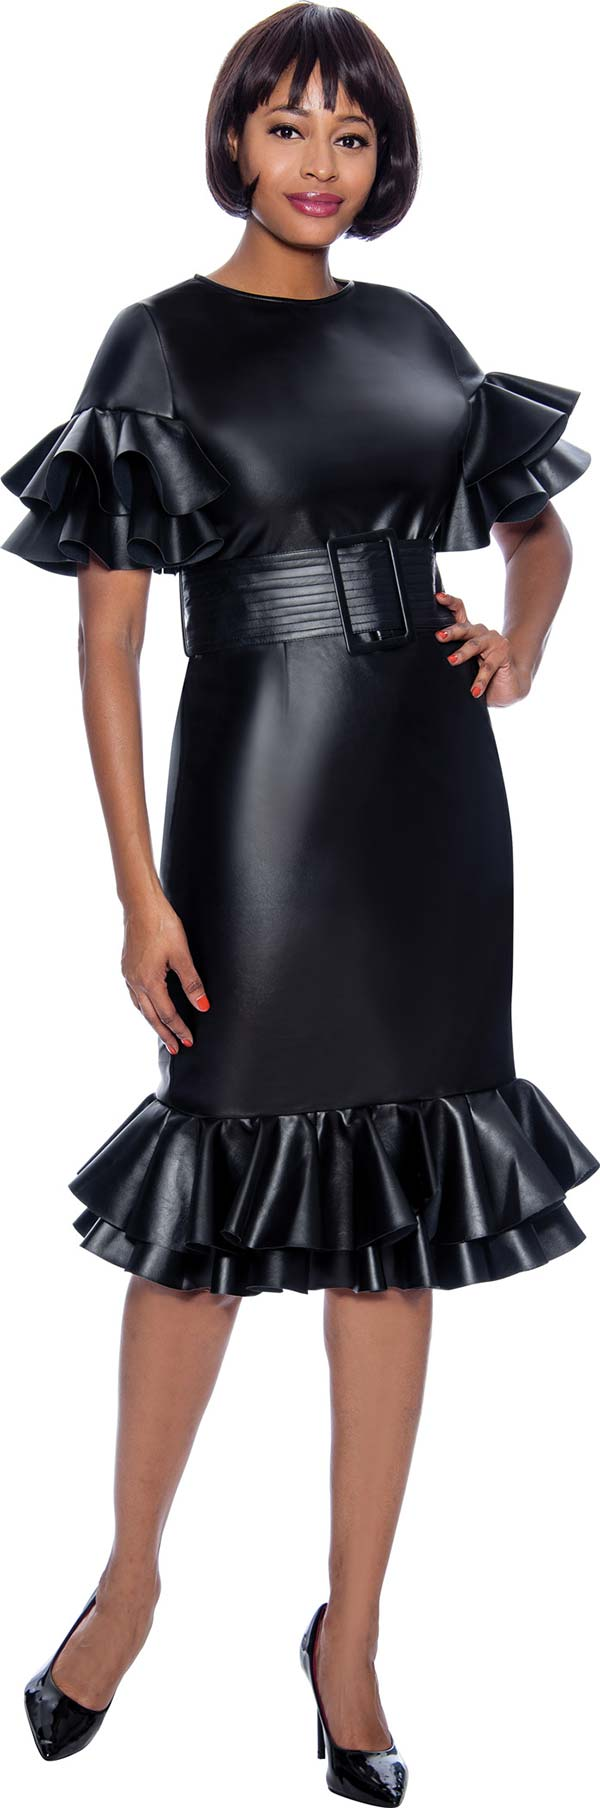 Susanna 3983 - Womens Faux Leather Fabric Dress With Ruffle Flounce Trims